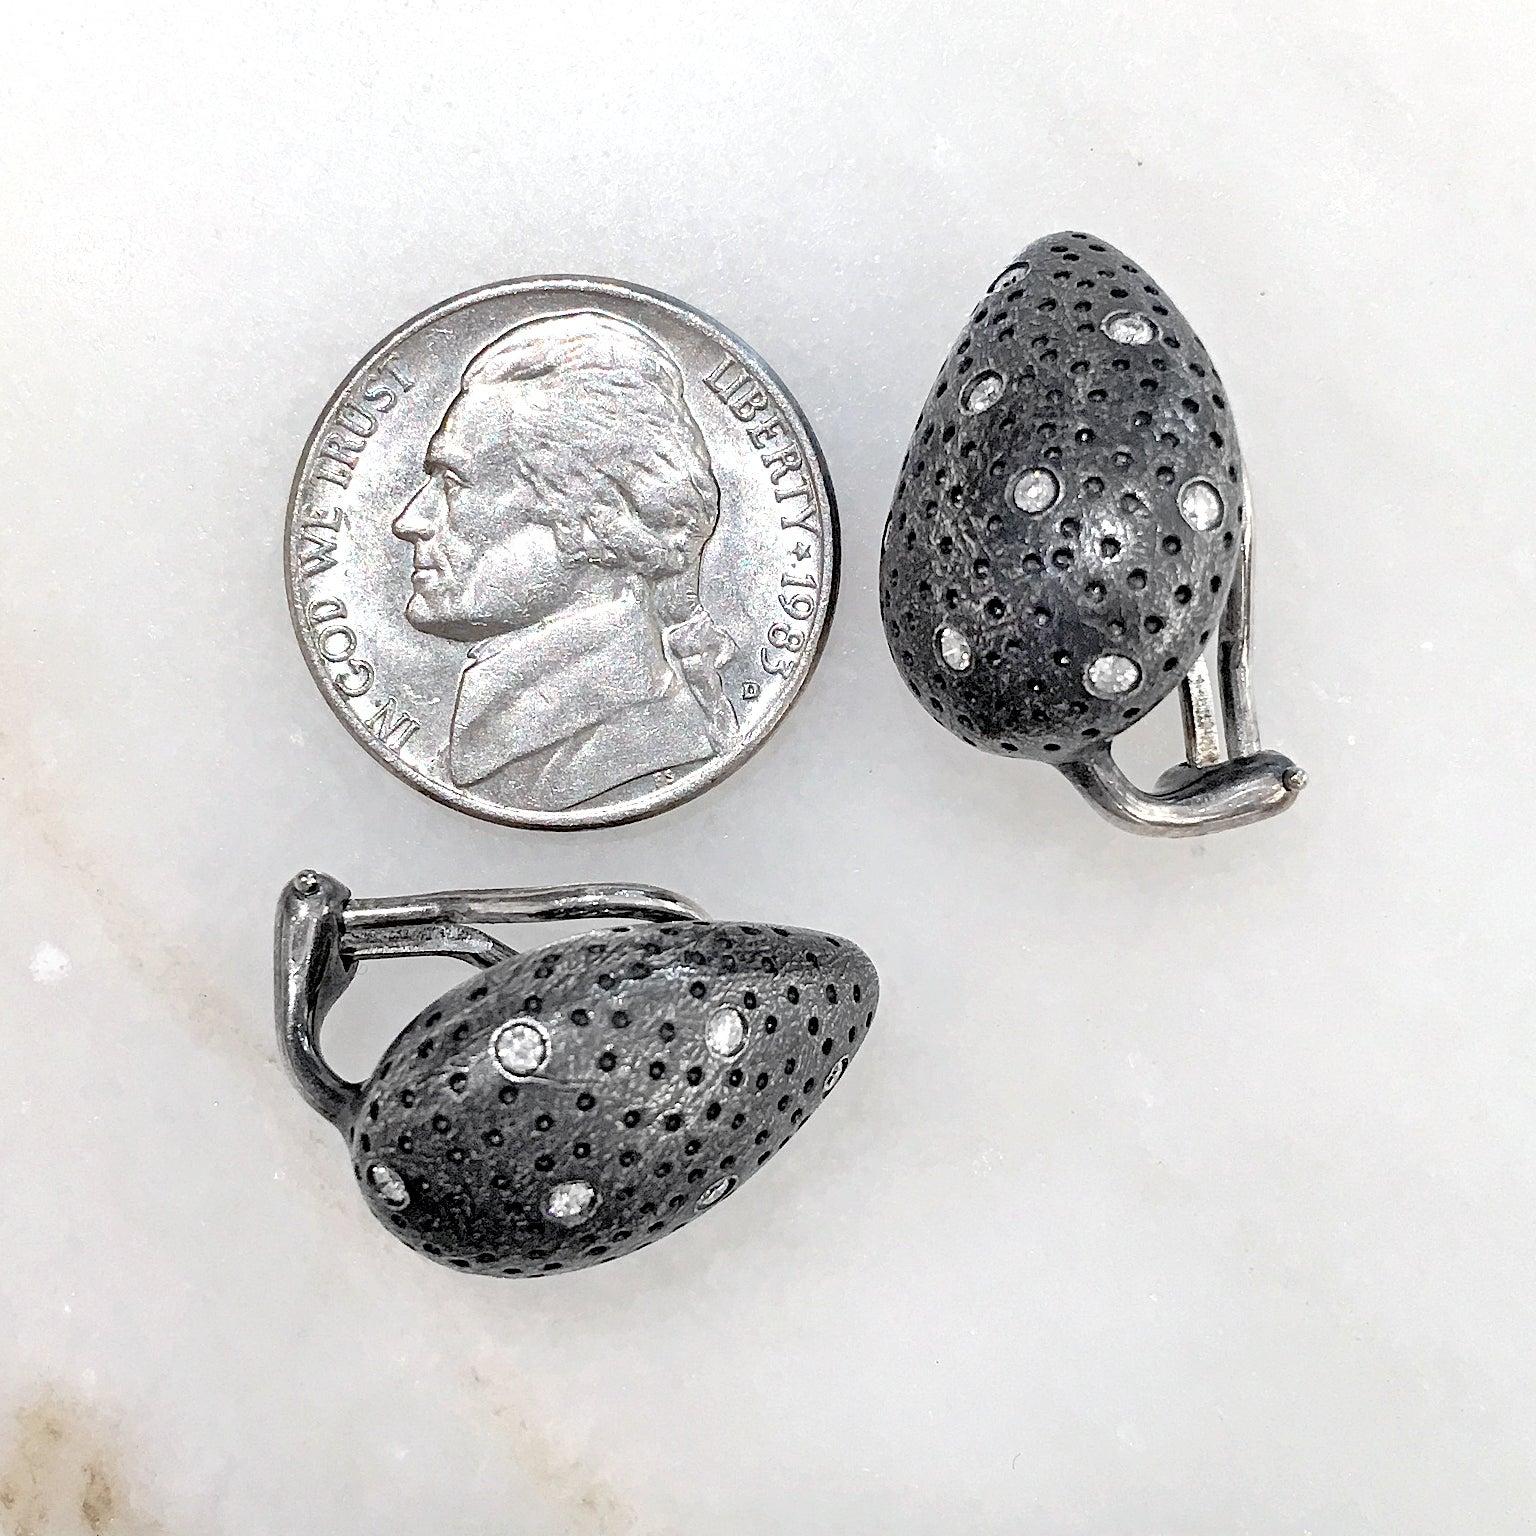 Pedro Boregaard White Diamond Embedded Oxidized Silver Clip Stud